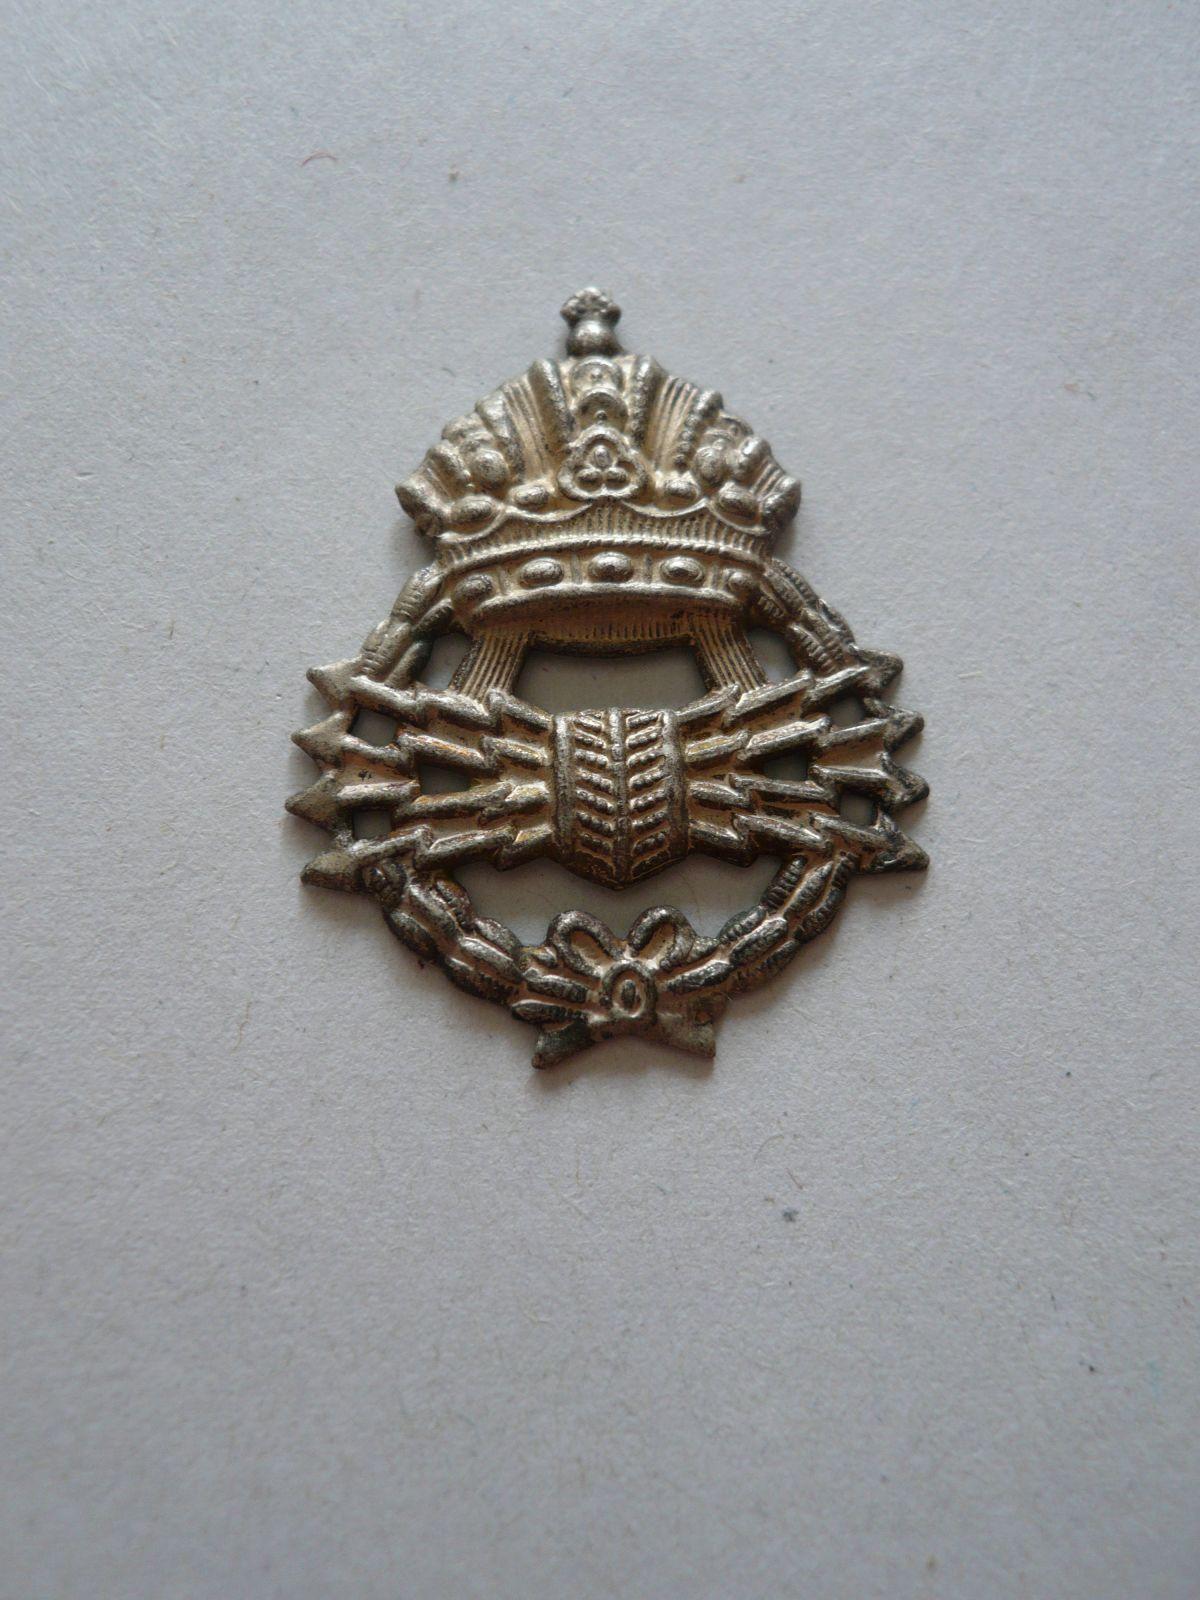 Plechová nášivka, Vojenský spojař, Rakousko-Uhersko